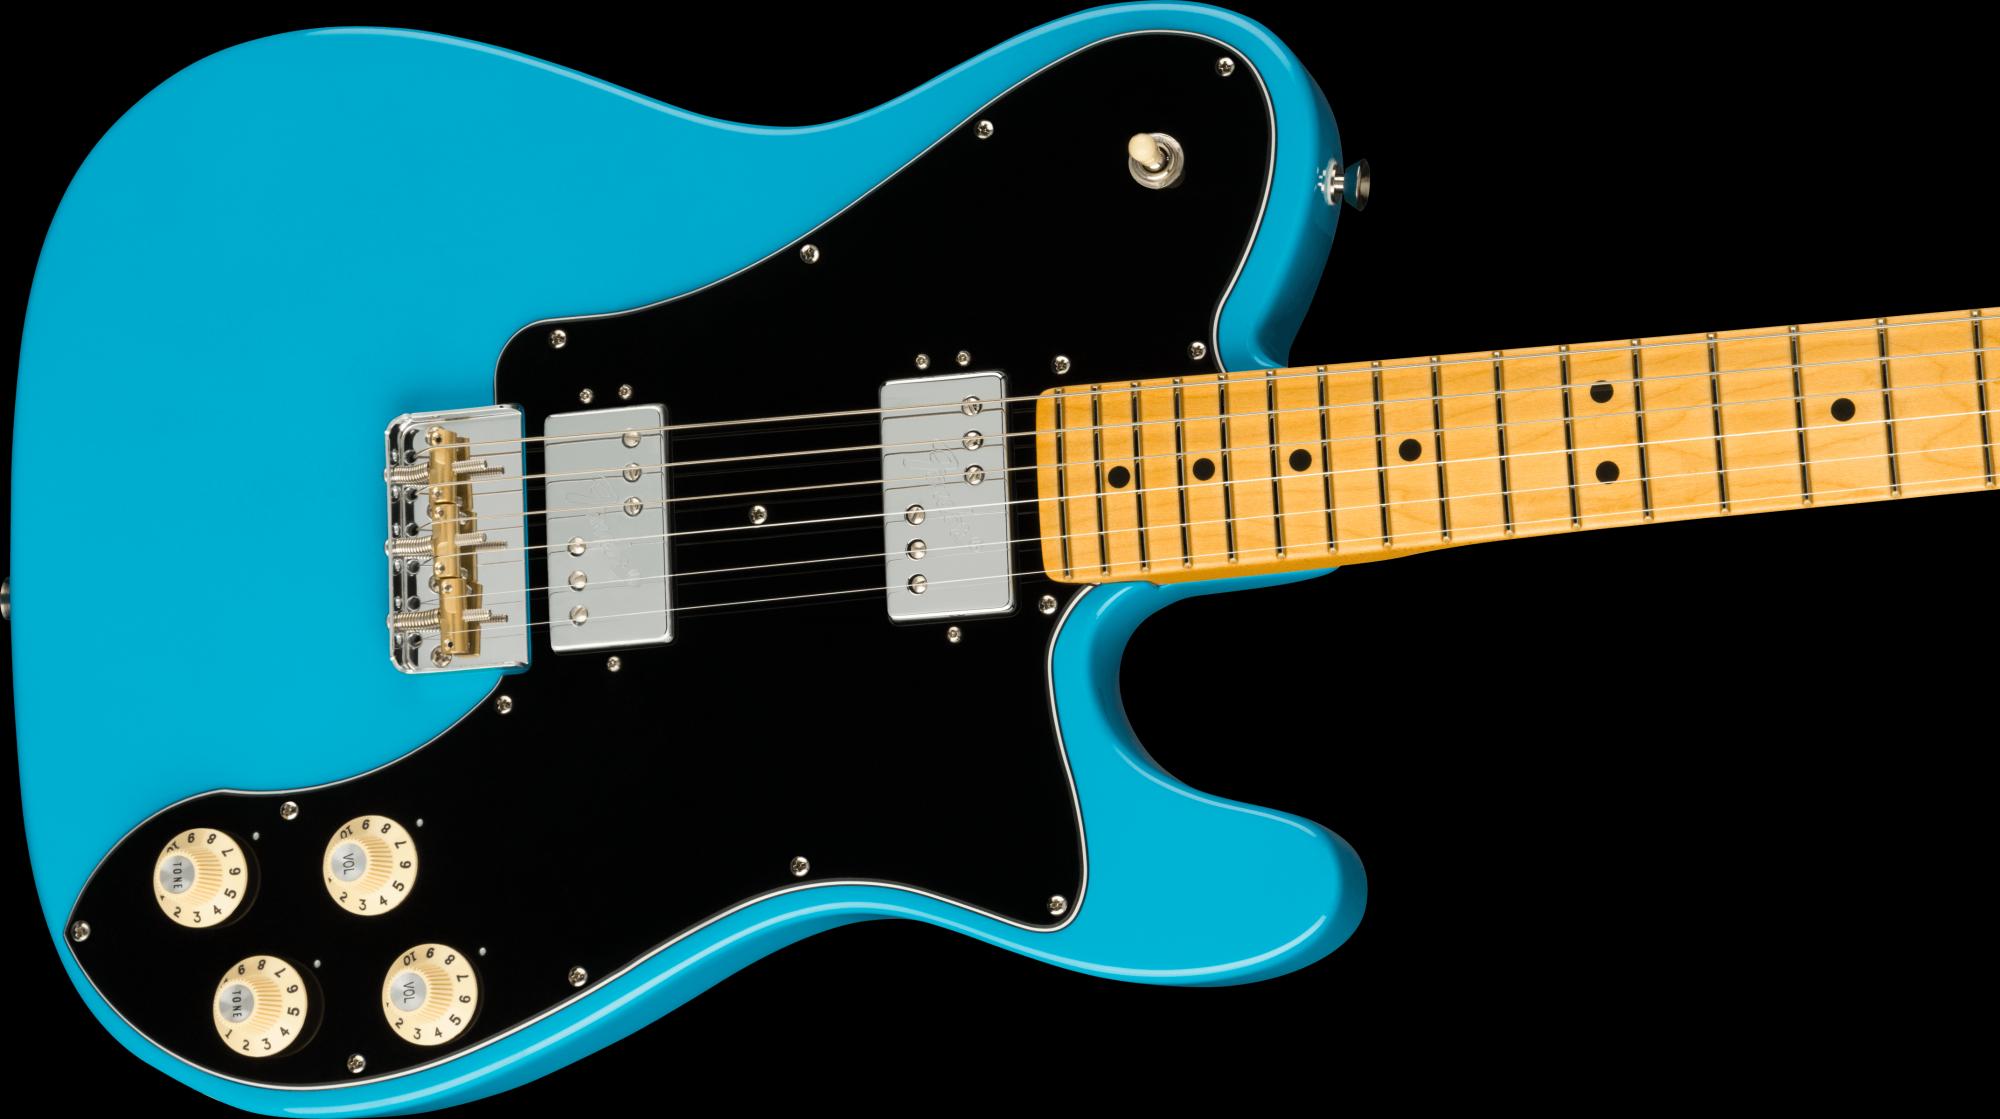 Fender American Professional II Telecaster Deluxe Maple Fingerboard - Miami Blue